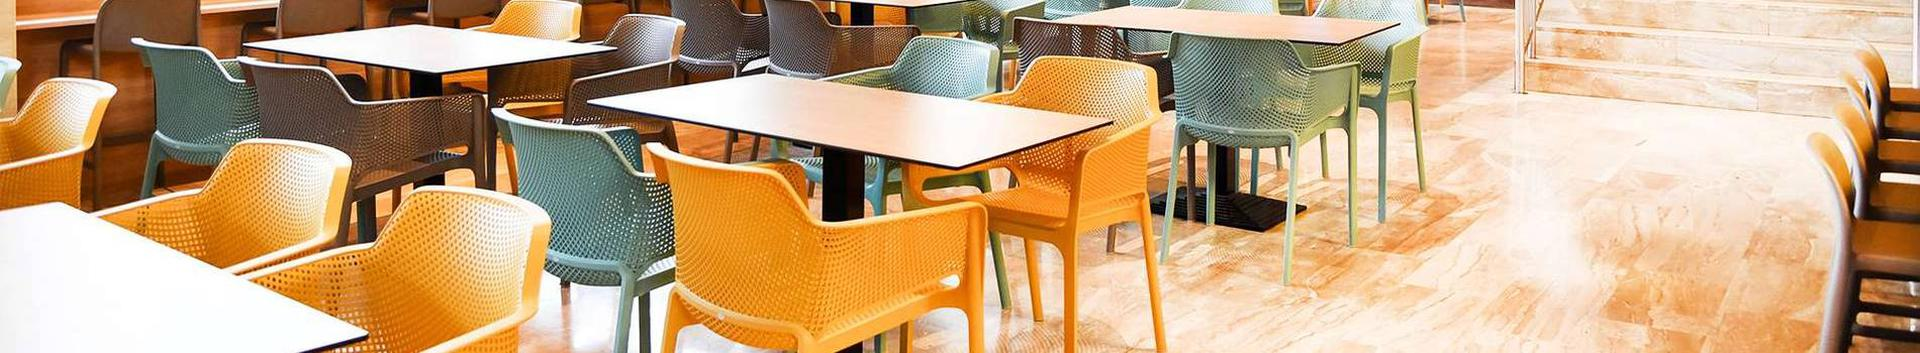 56101_toitlustus-restoran-jm-_97449554_xl.jpg